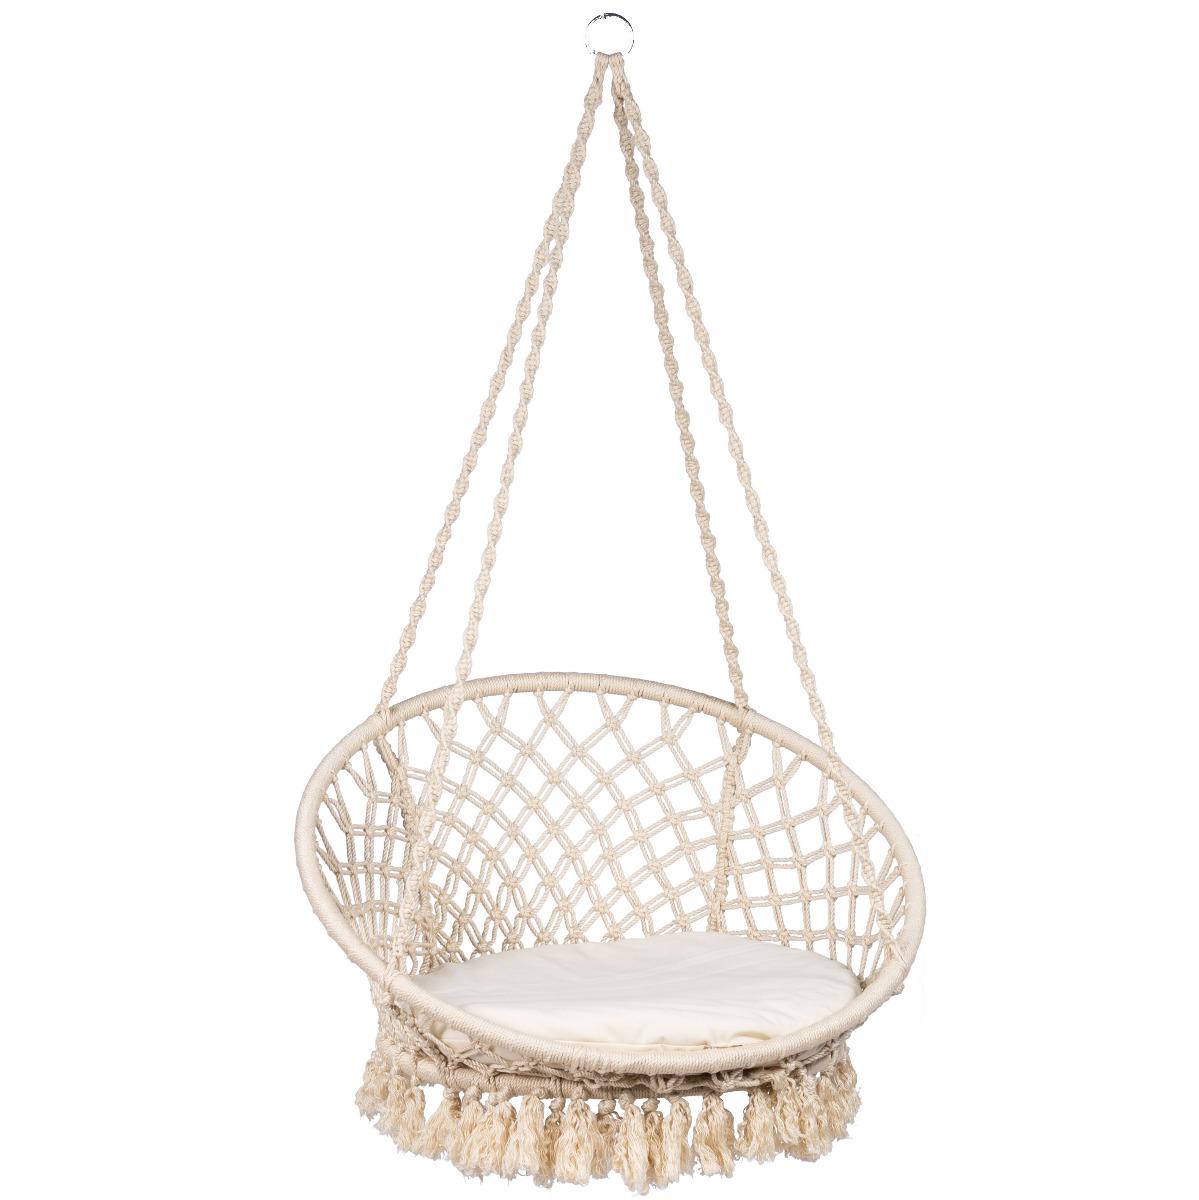 Hangstoel E�npersoons 'Macram�' White - Wit - Ecru - Tropilex �